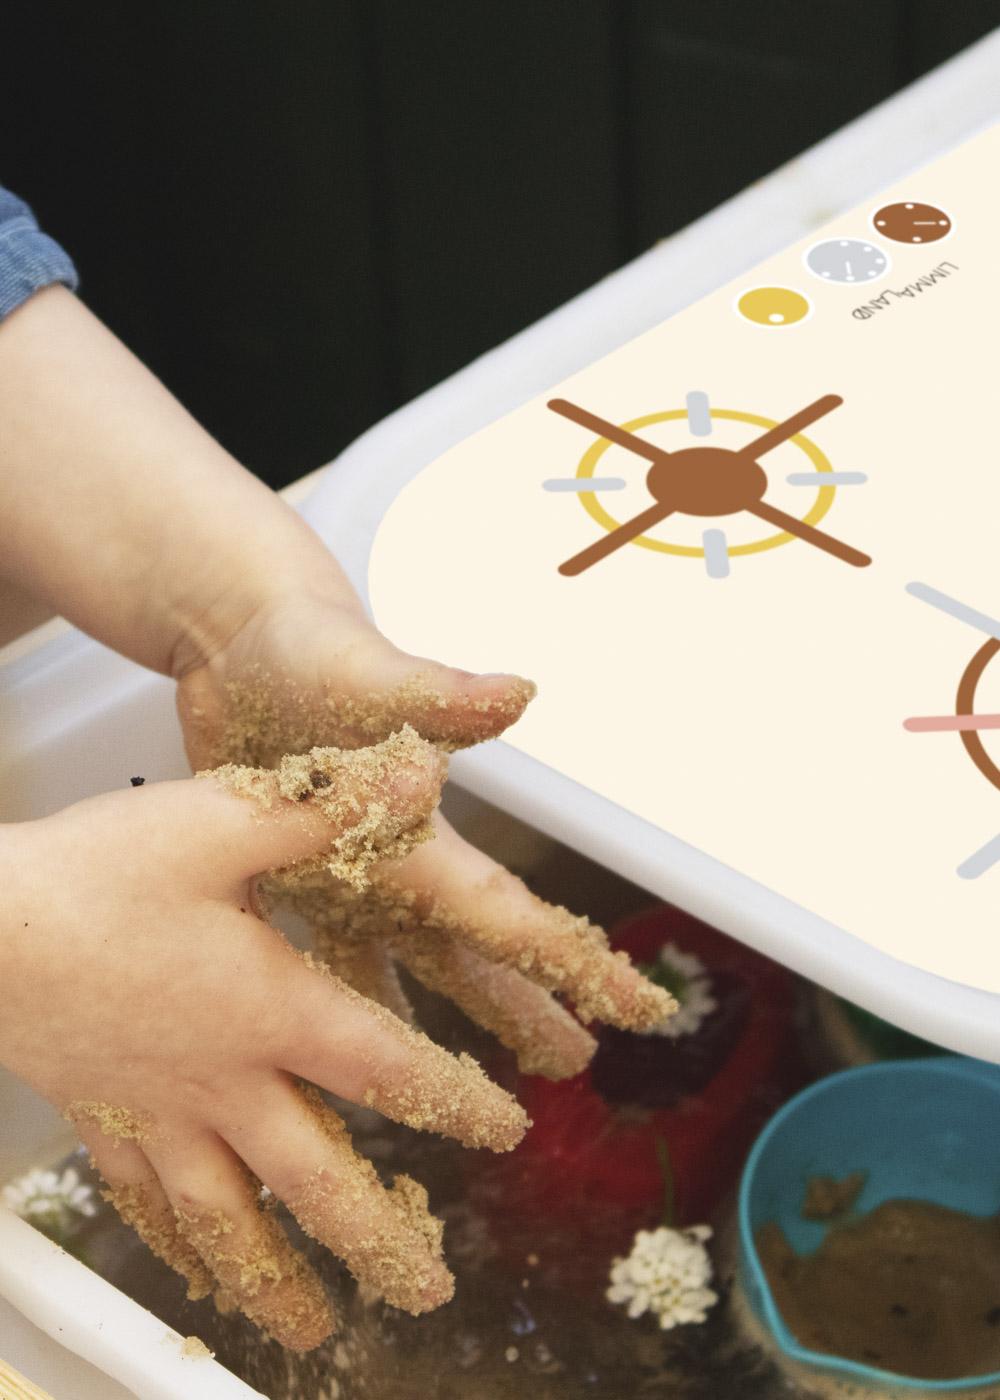 Ikea Trofast Box Kinderherd Erdig sand Teilansicht Matsche